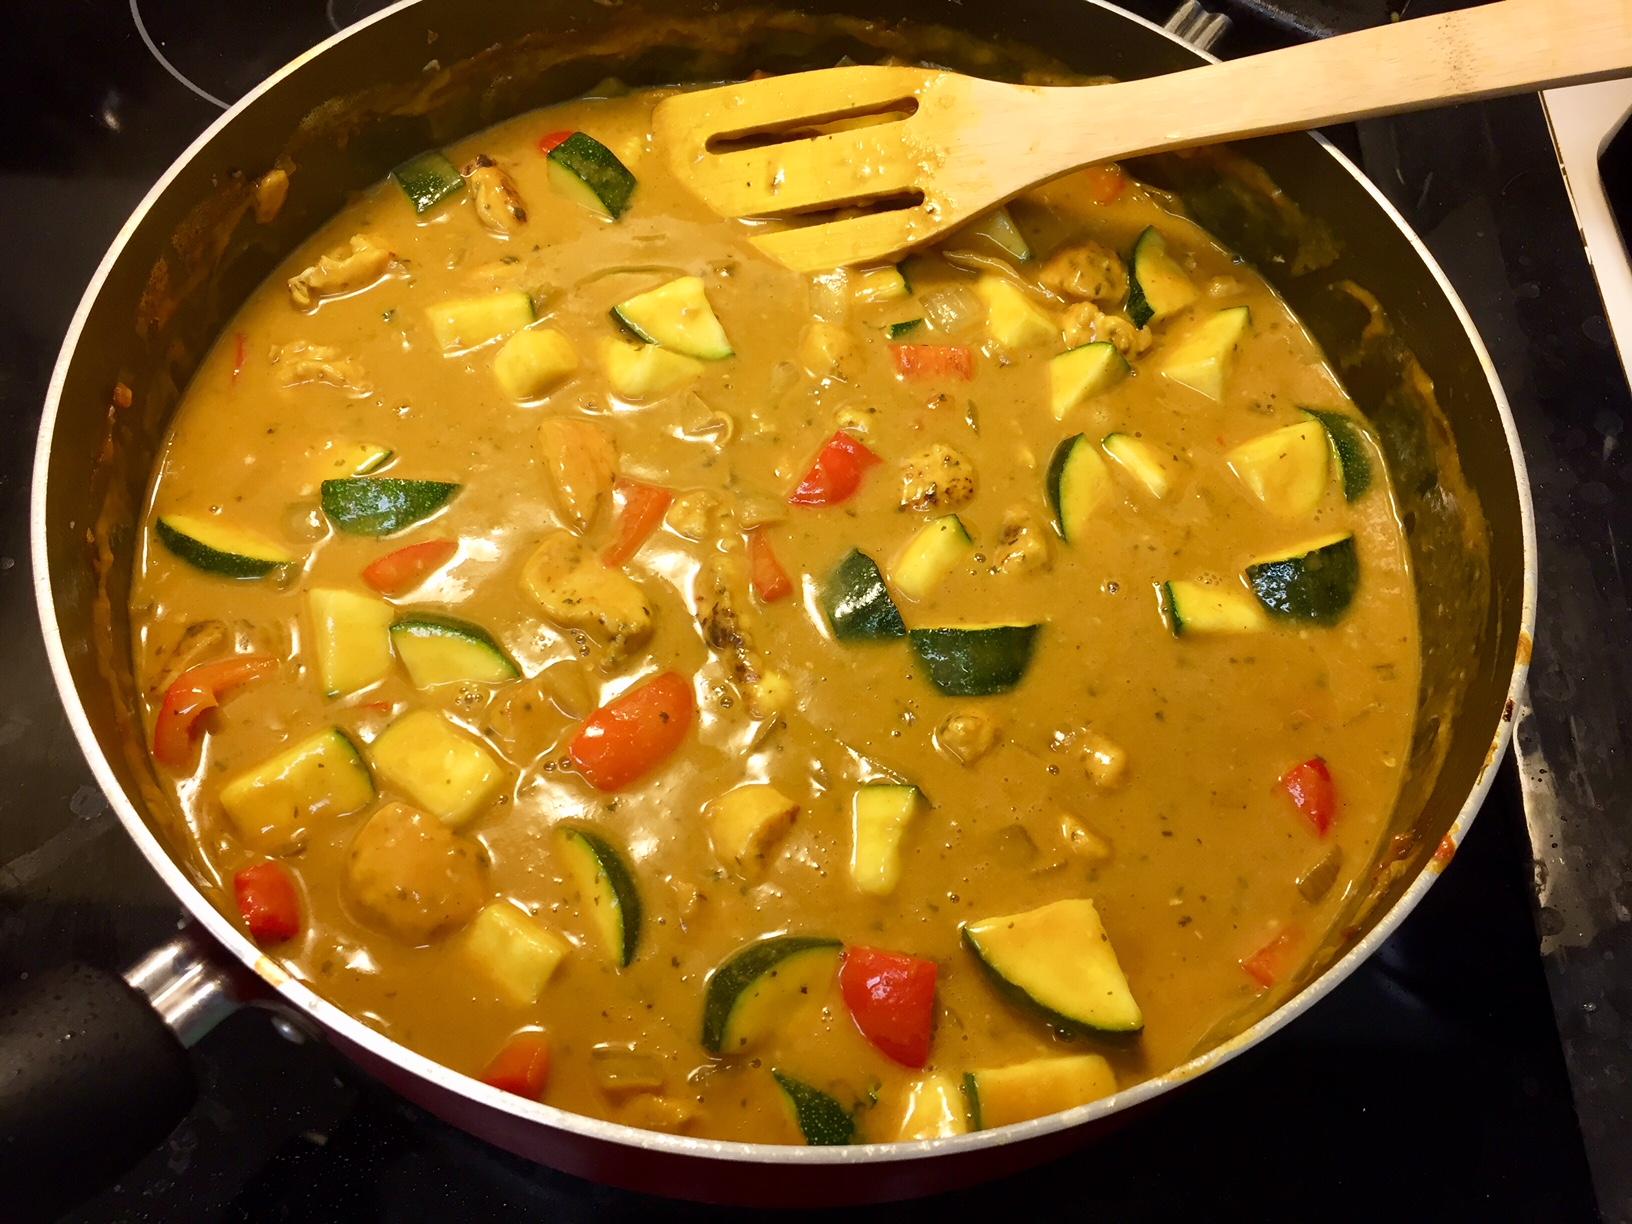 Chef John's Peanut Curry Chicken Kelly